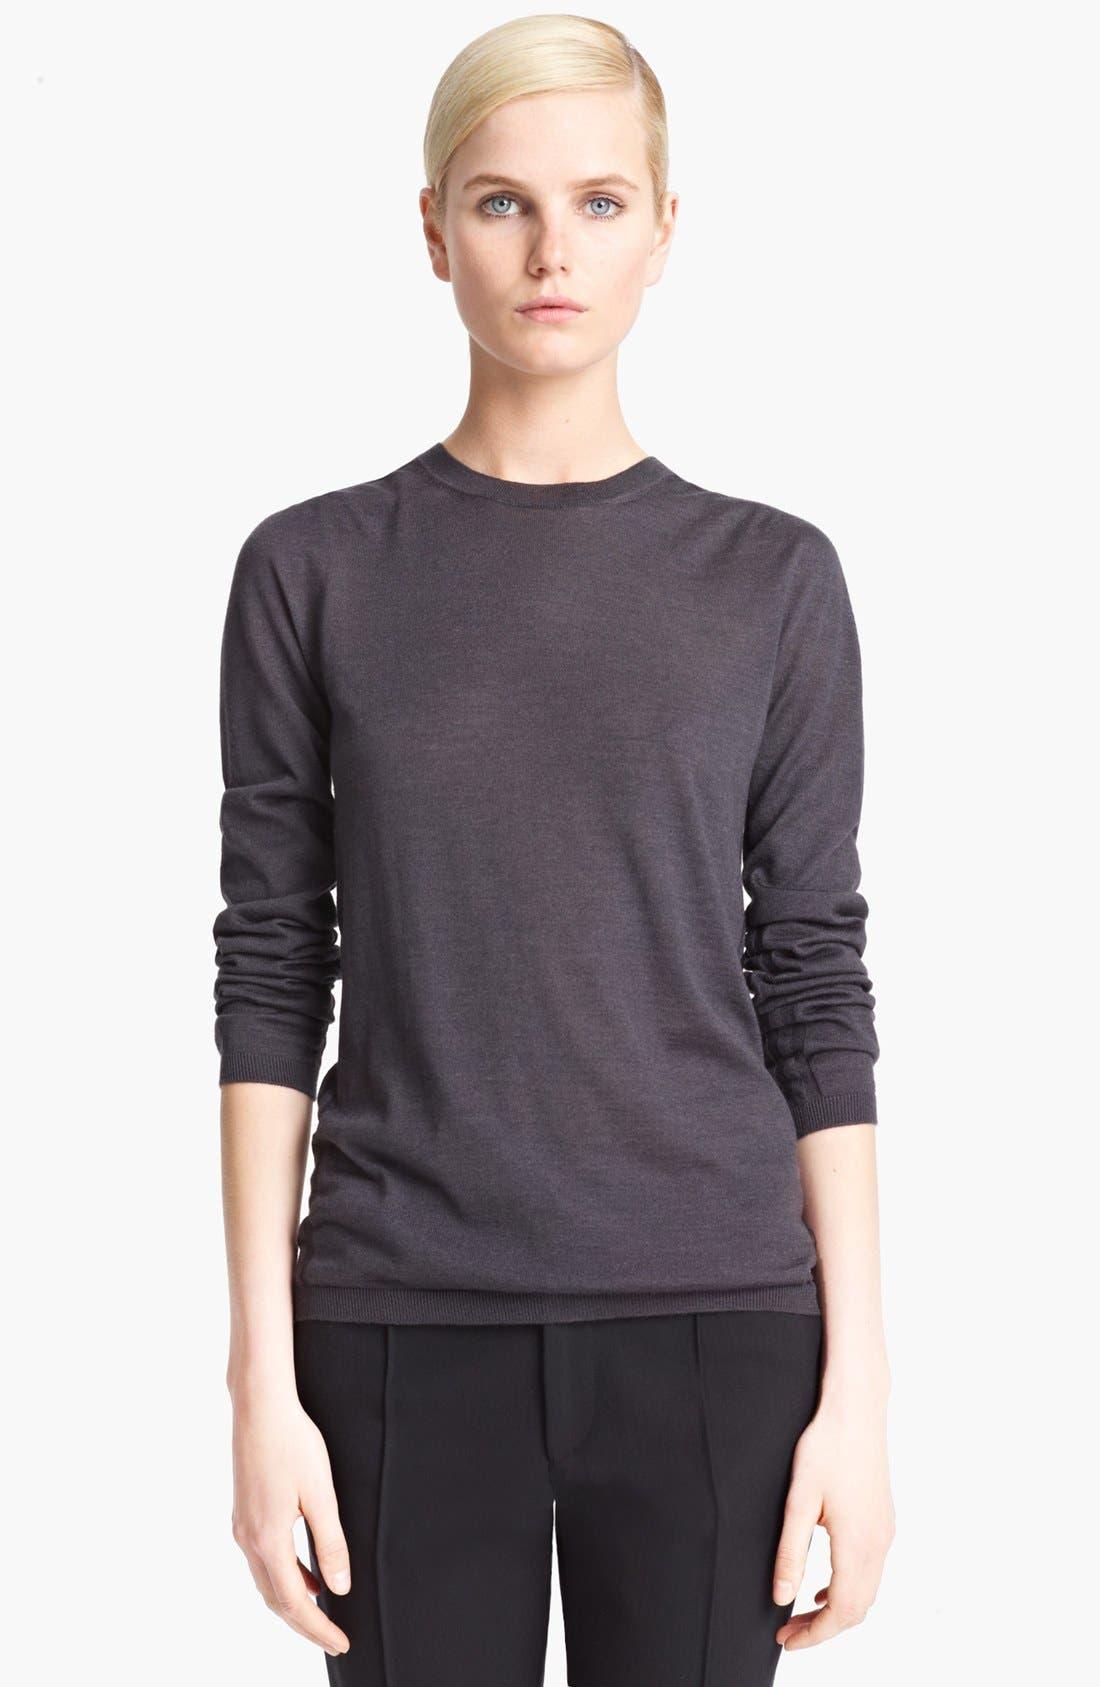 Alternate Image 1 Selected - Jil Sander Cashmere & Silk Crewneck Sweater